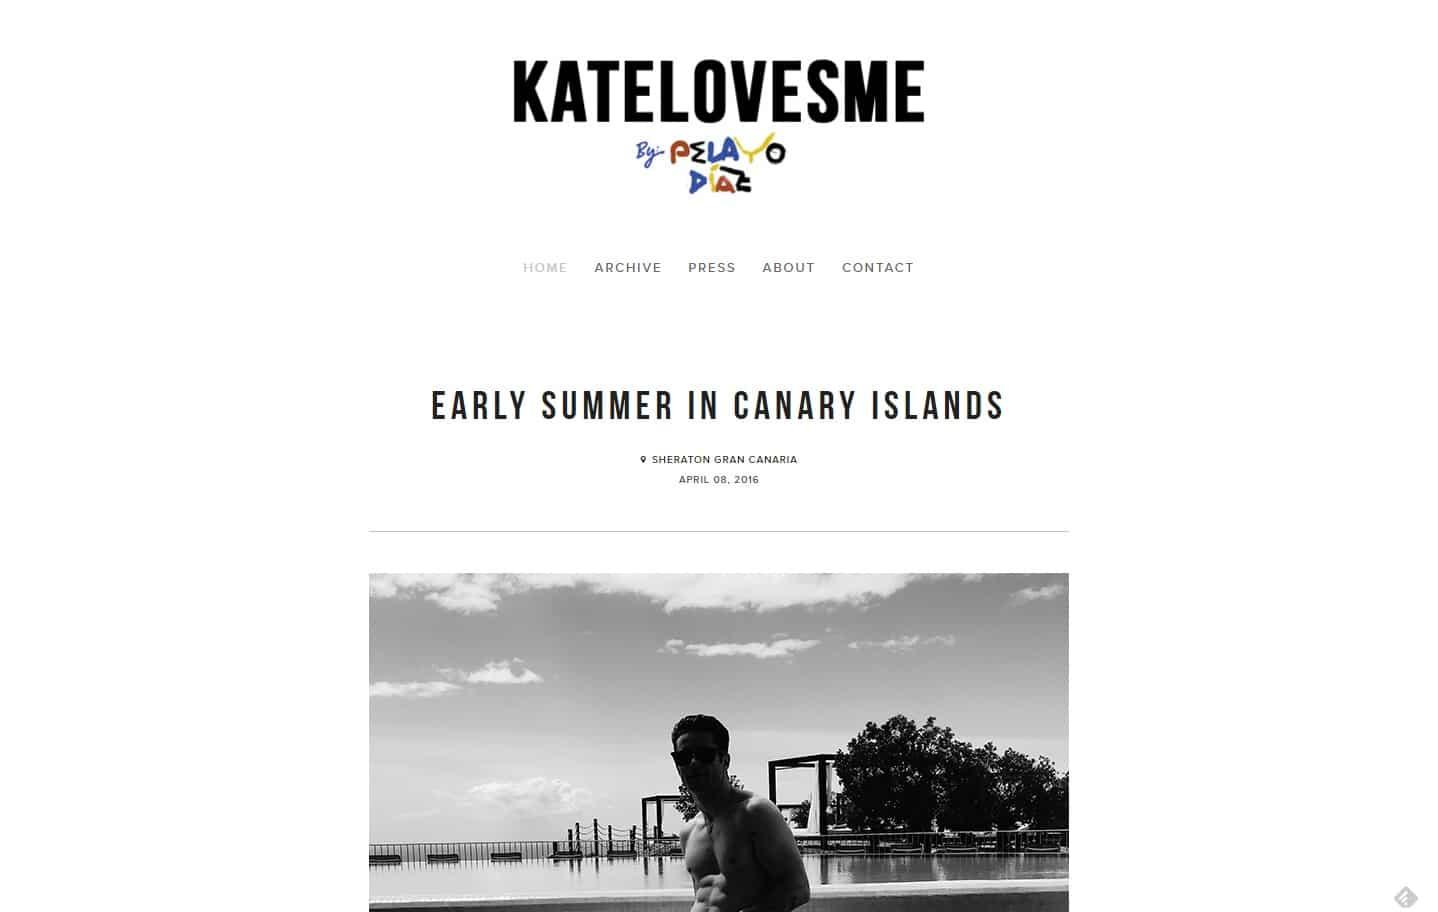 katelovesme street style blog